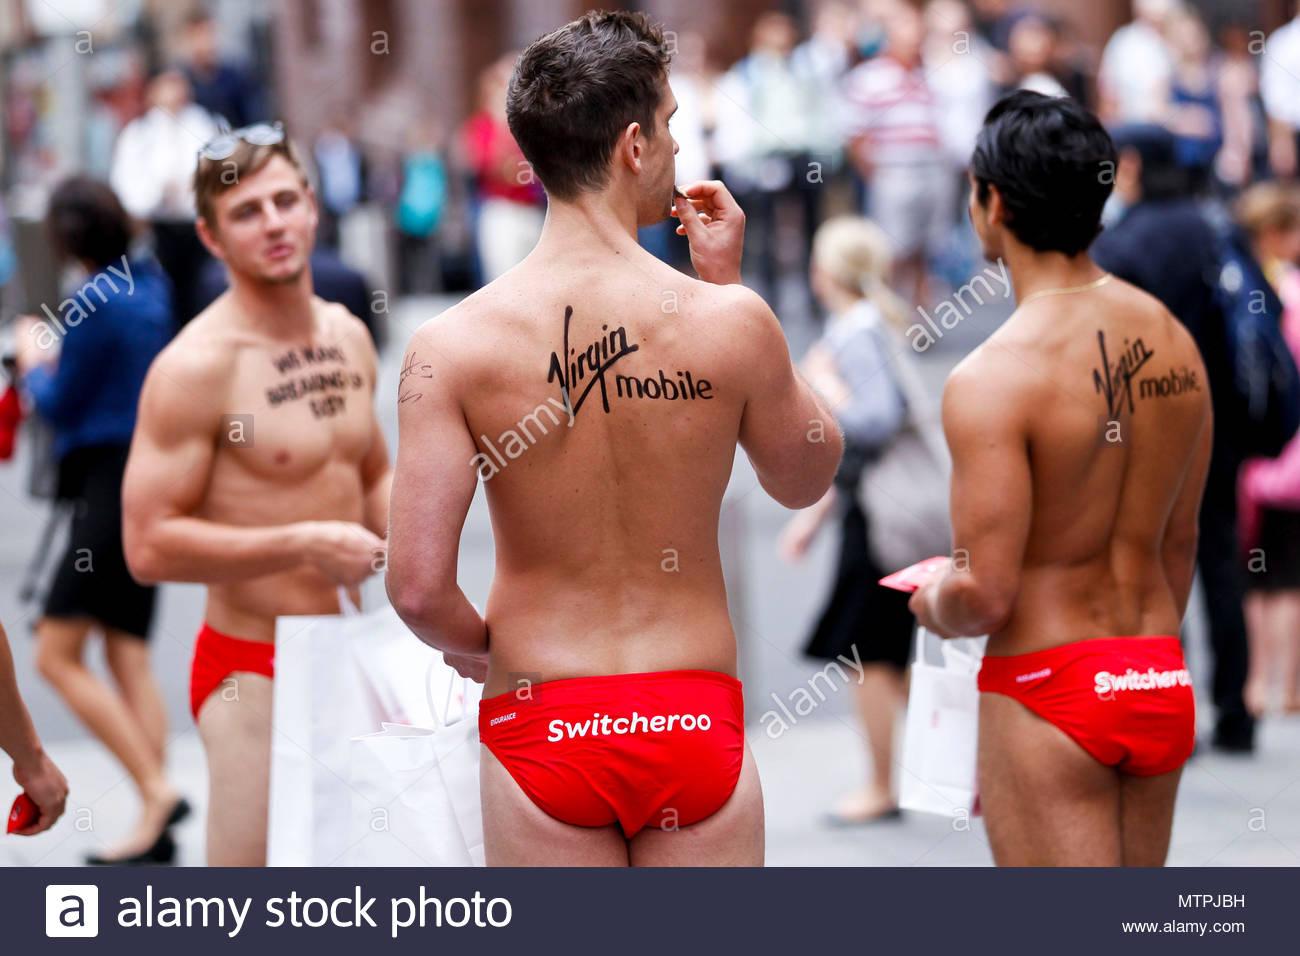 boys losing their virginity